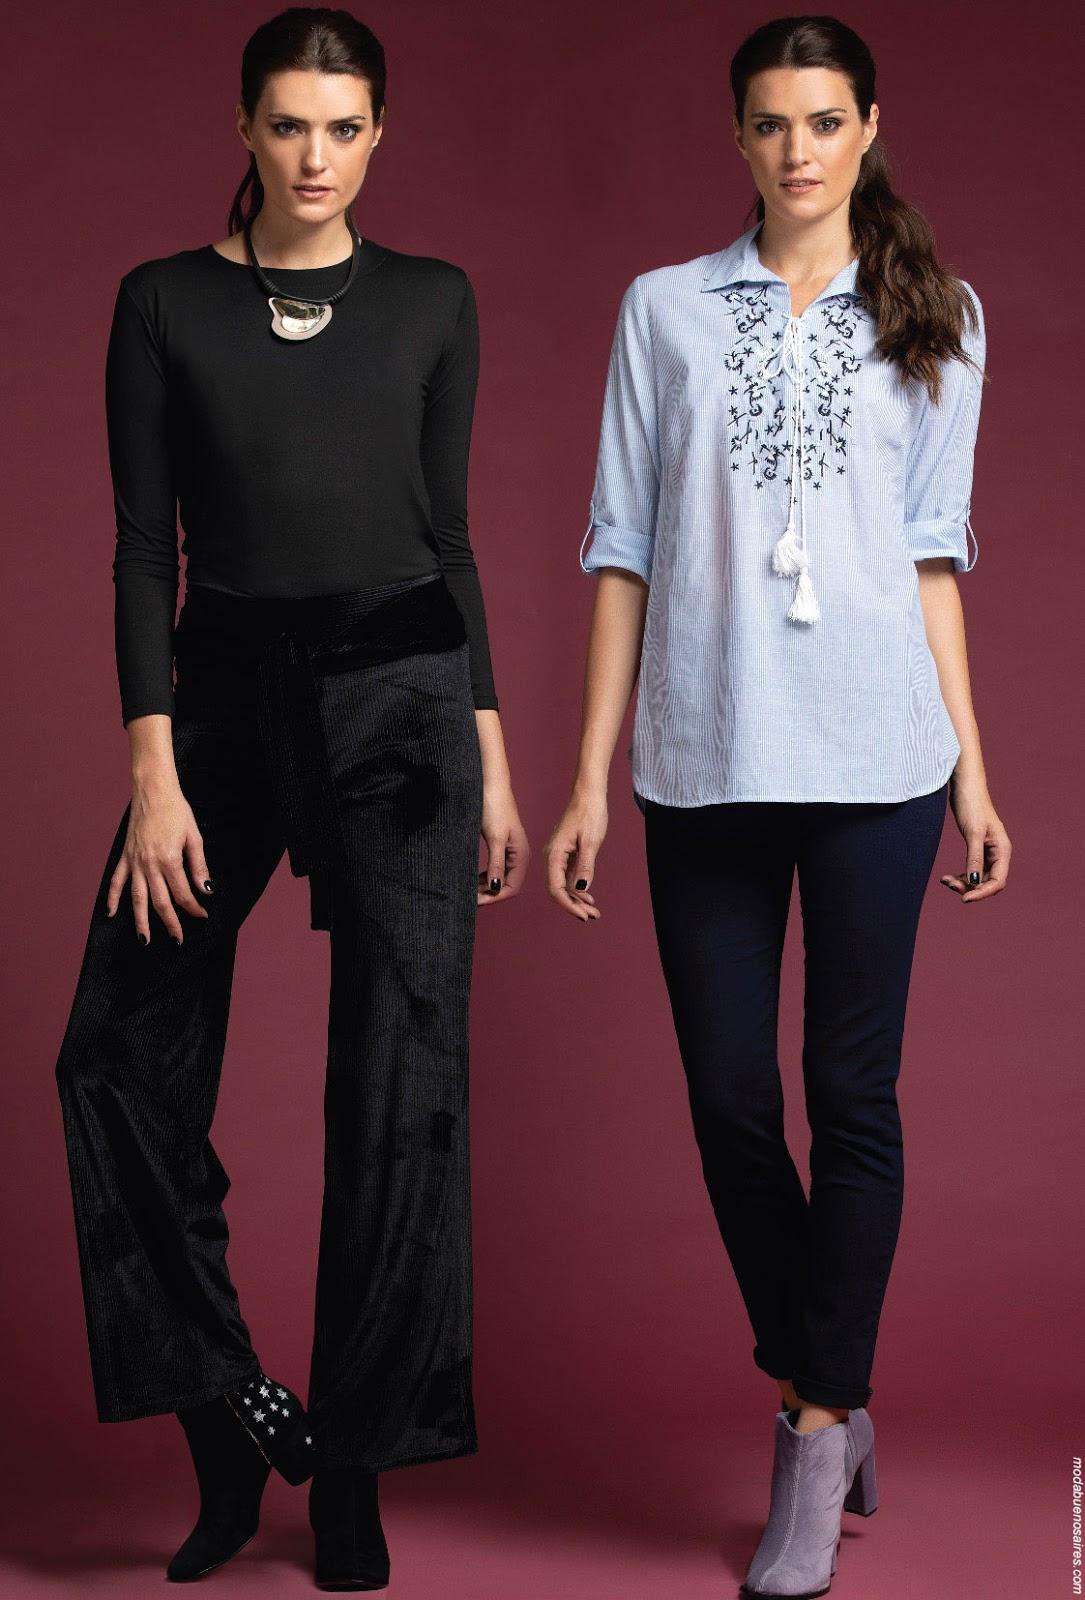 Moda otoño invierno 2019 moda mujer looks tendencia. Invierno 2019 mujer.